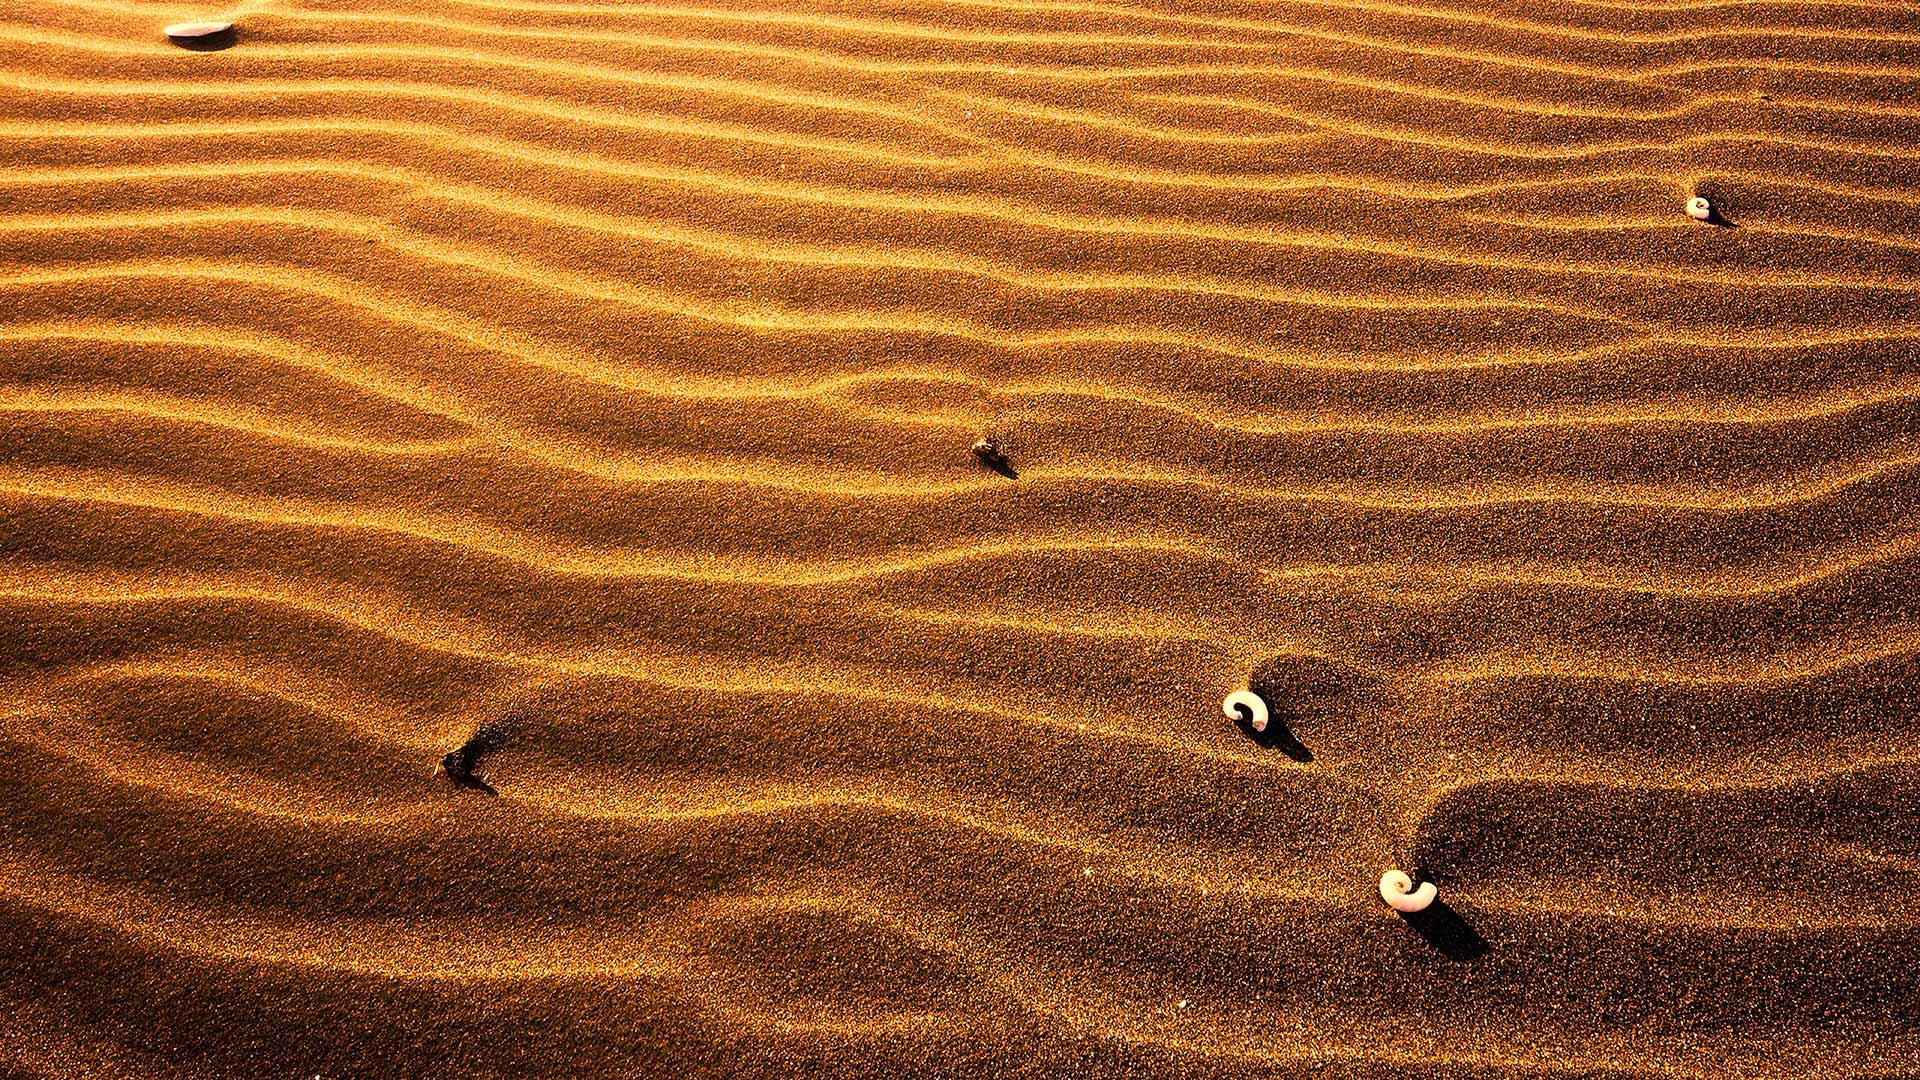 sandball-background